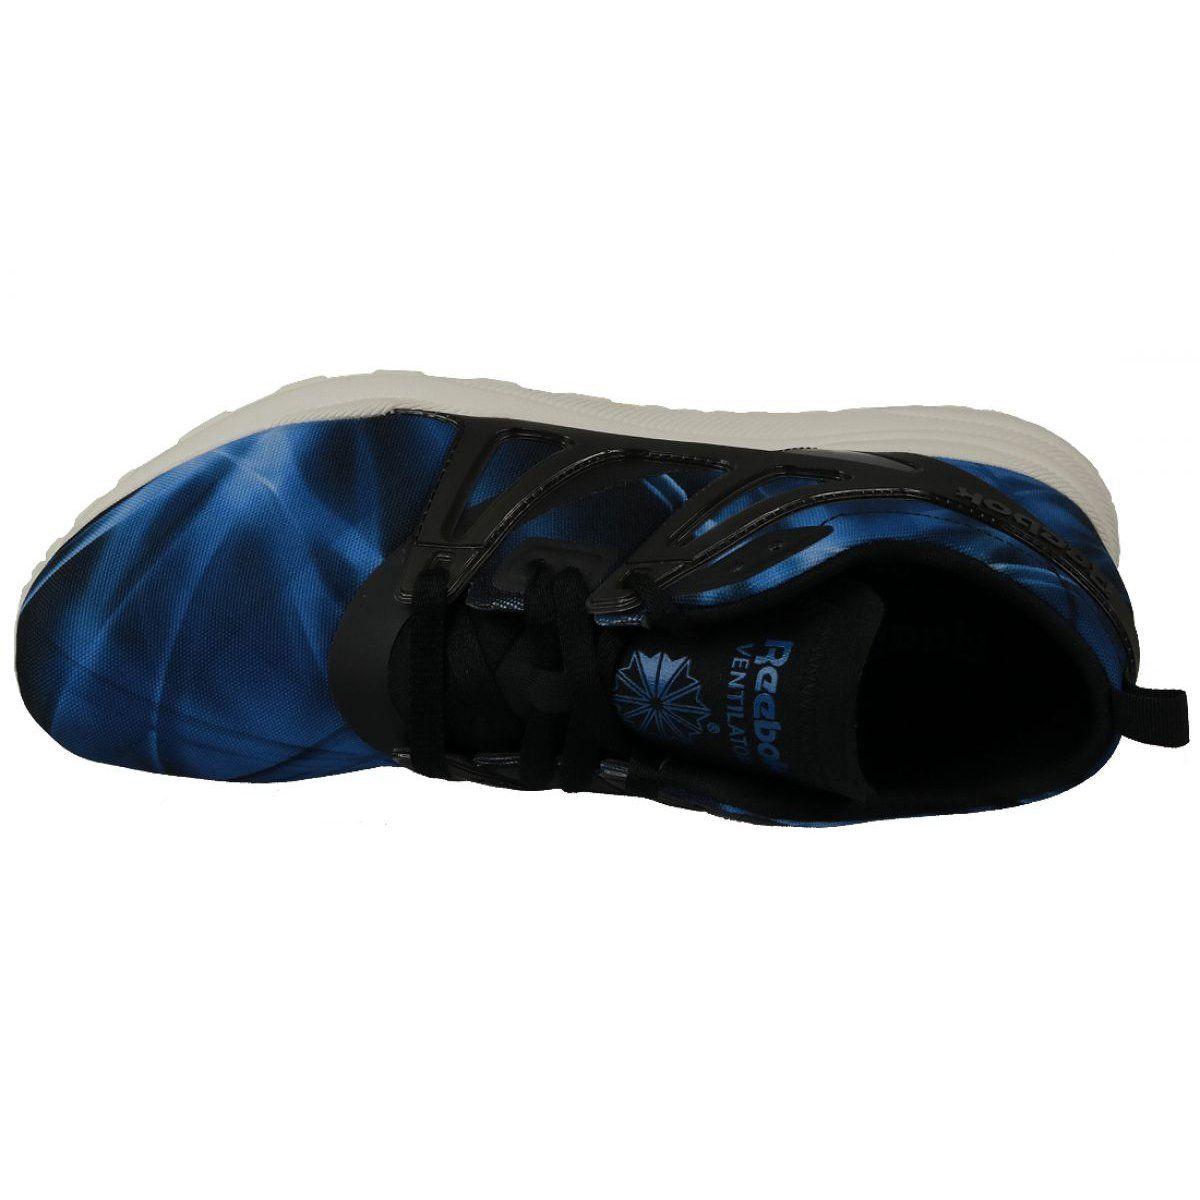 Buty Reebok Classic Ventilator M V69416 Niebieskie Blue Shoes Reebok Classic Reebok